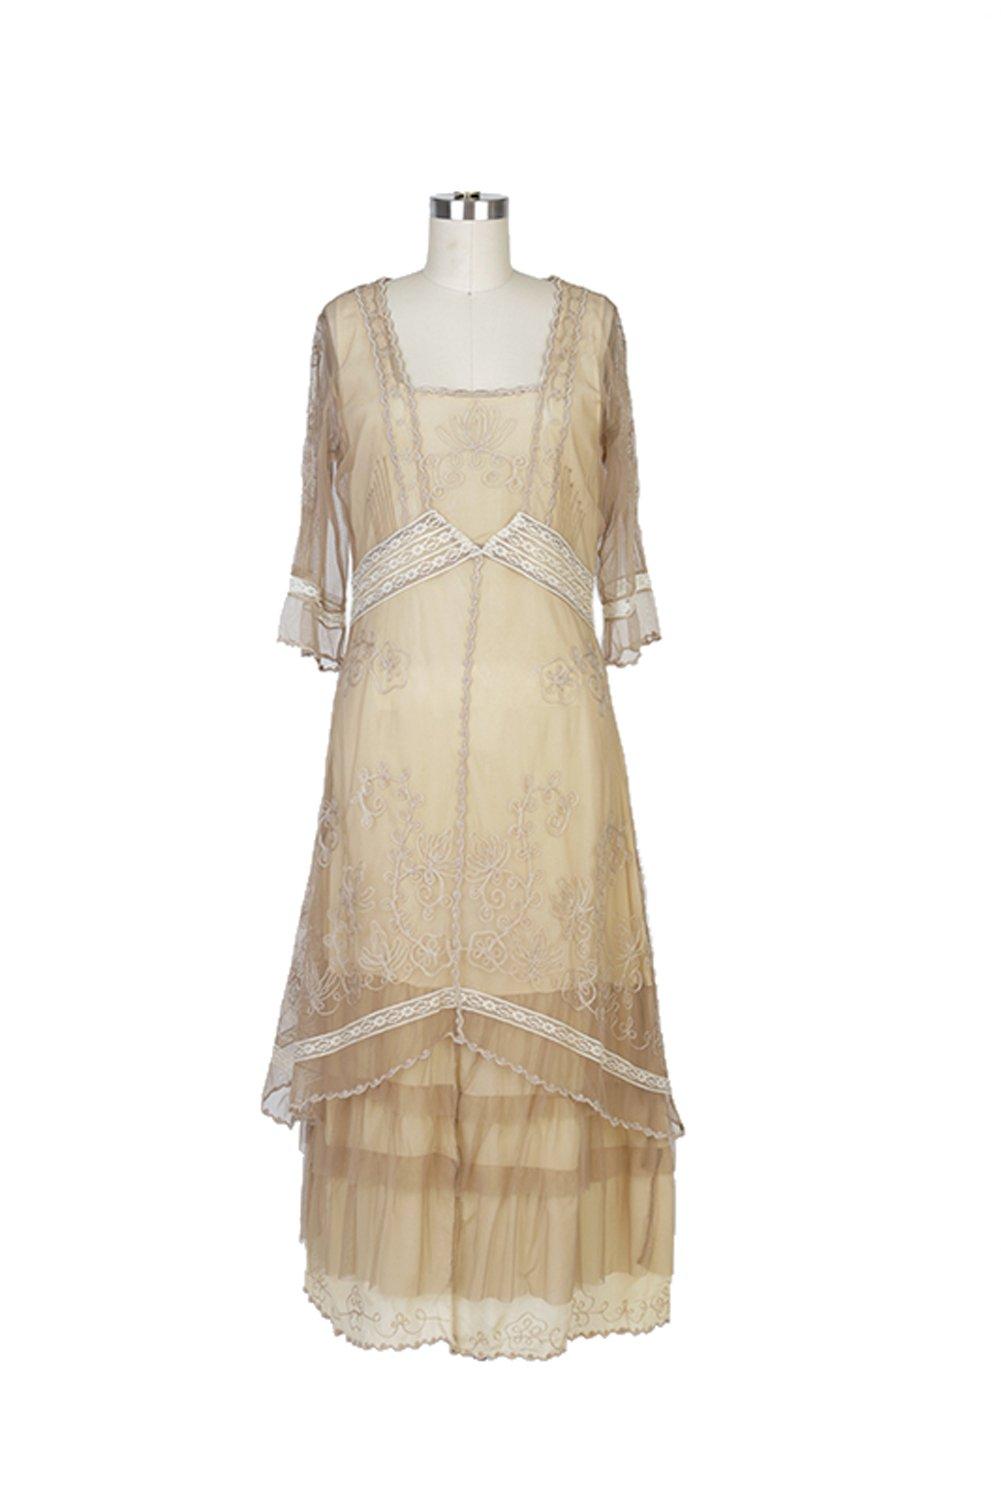 Nataya 2101 Women's Titanic Vintage Style Dress in Butter (Medium) by Nataya